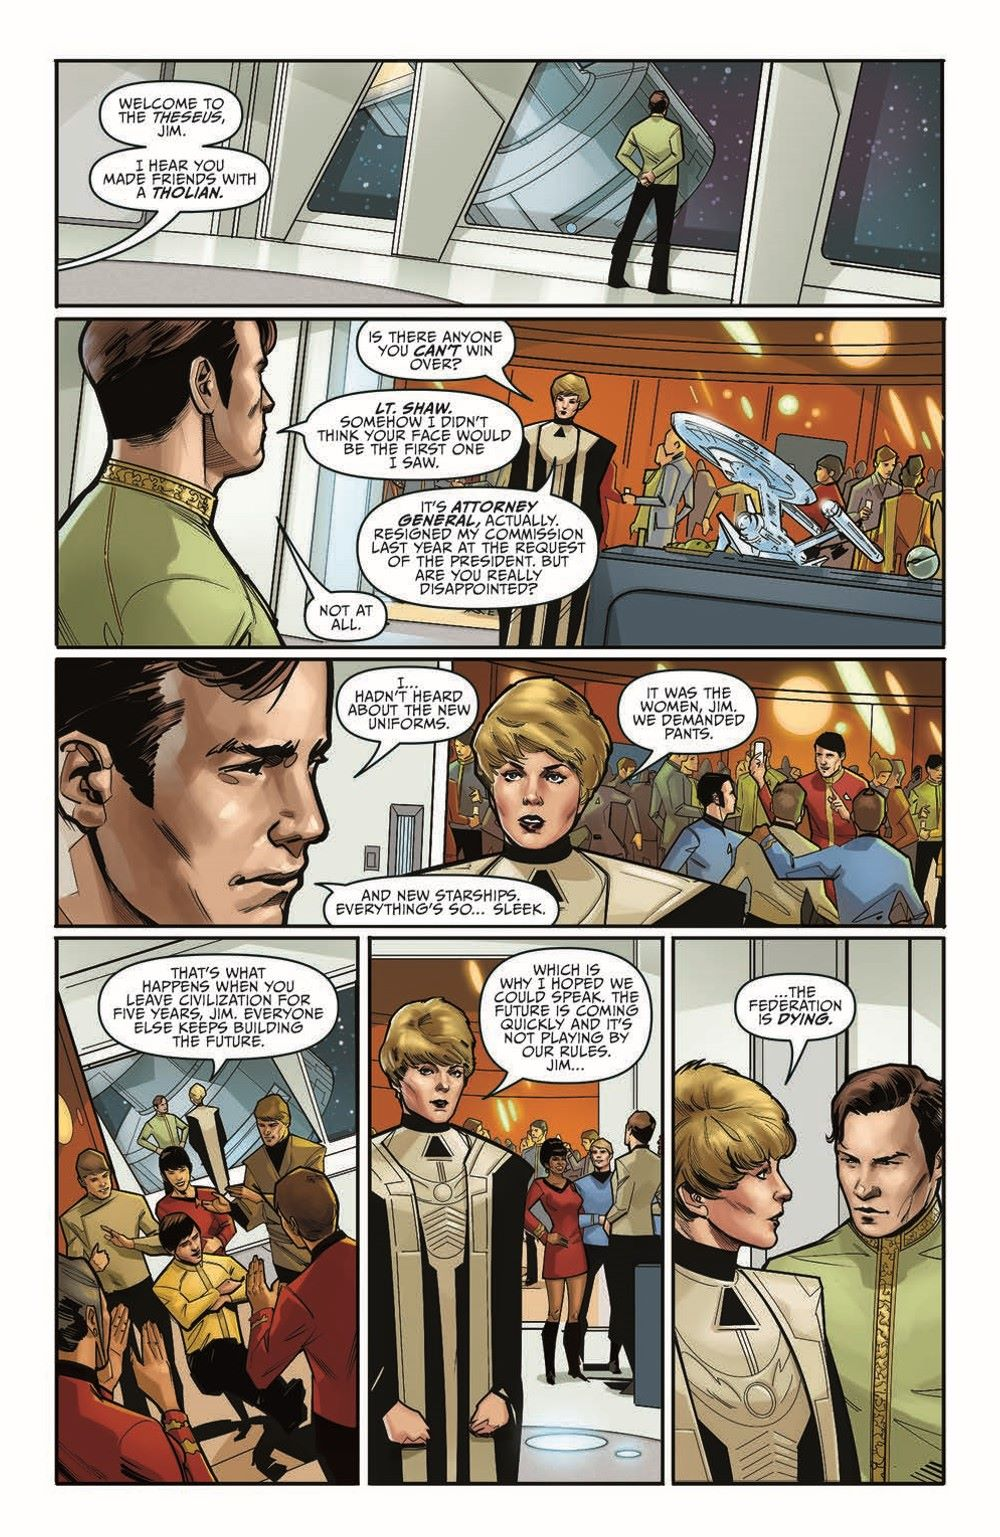 ST_YearFive_Vol3_pr-7 ComicList Previews: STAR TREK YEAR FIVE VOLUME 3 WEAKER THAN MAN TP